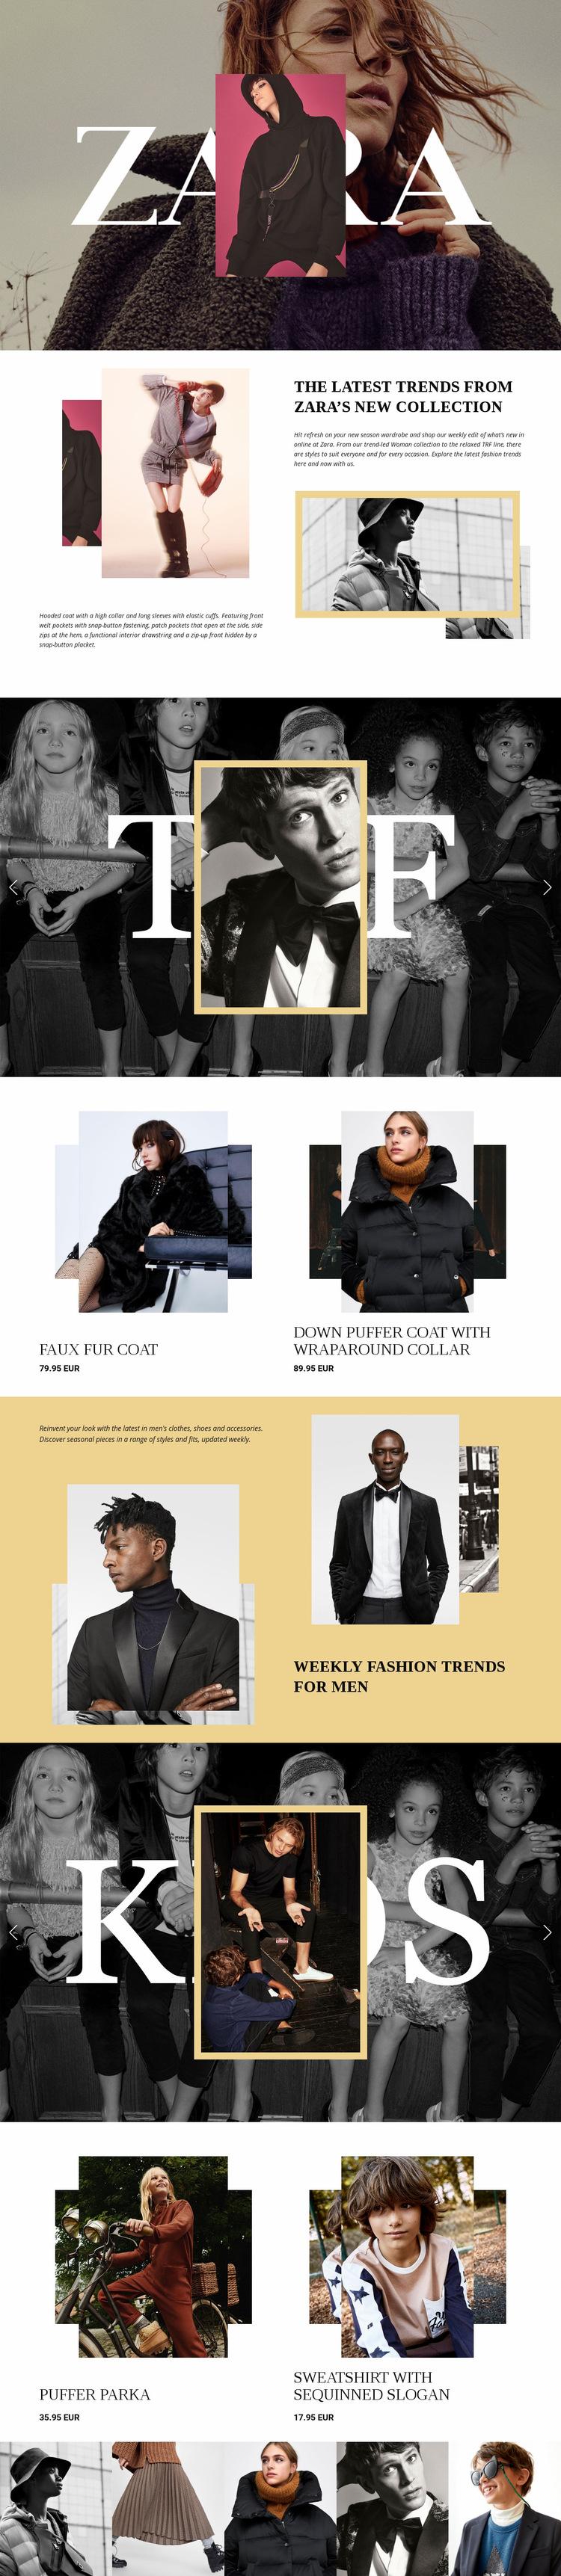 Zara Web Page Design